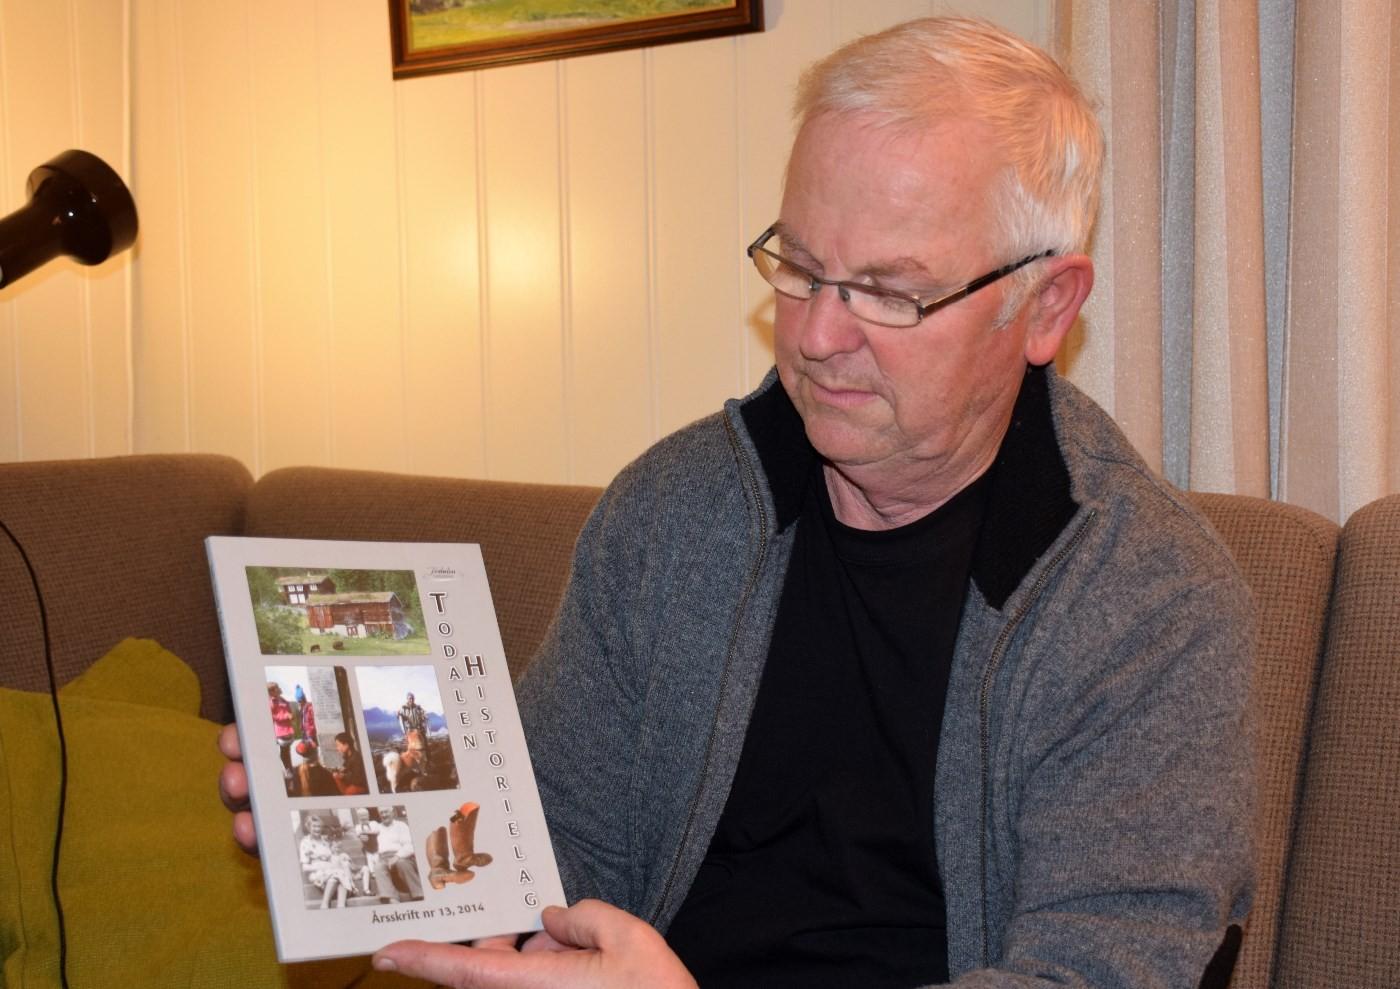 Leiar i Todalen historielag, John Moe, med årsskriftet for 2014.  Arkivfoto: Jon Olav Ørsal